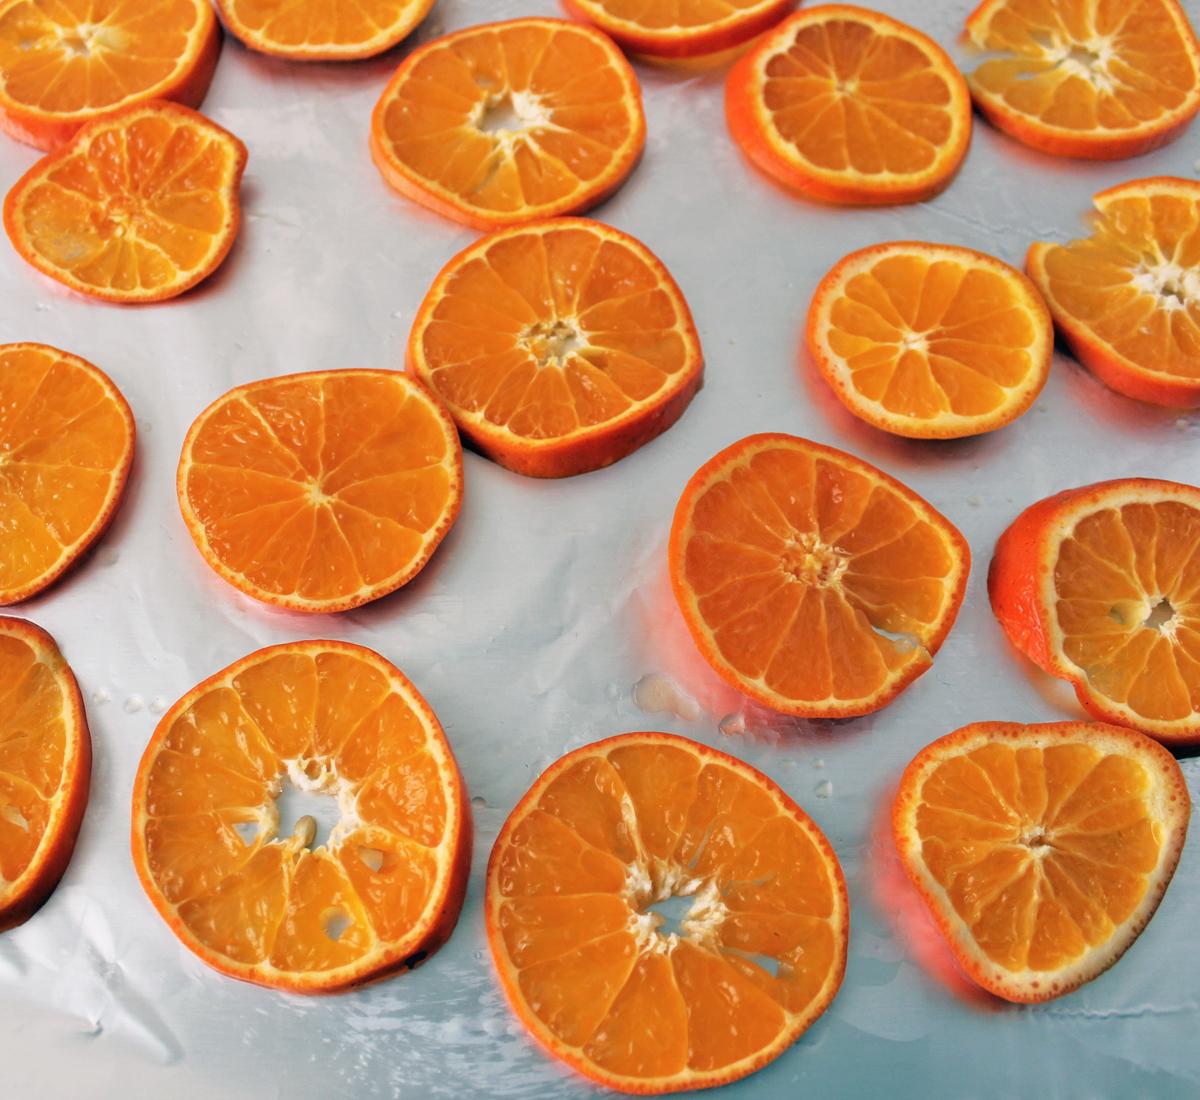 orange-arrangements-3